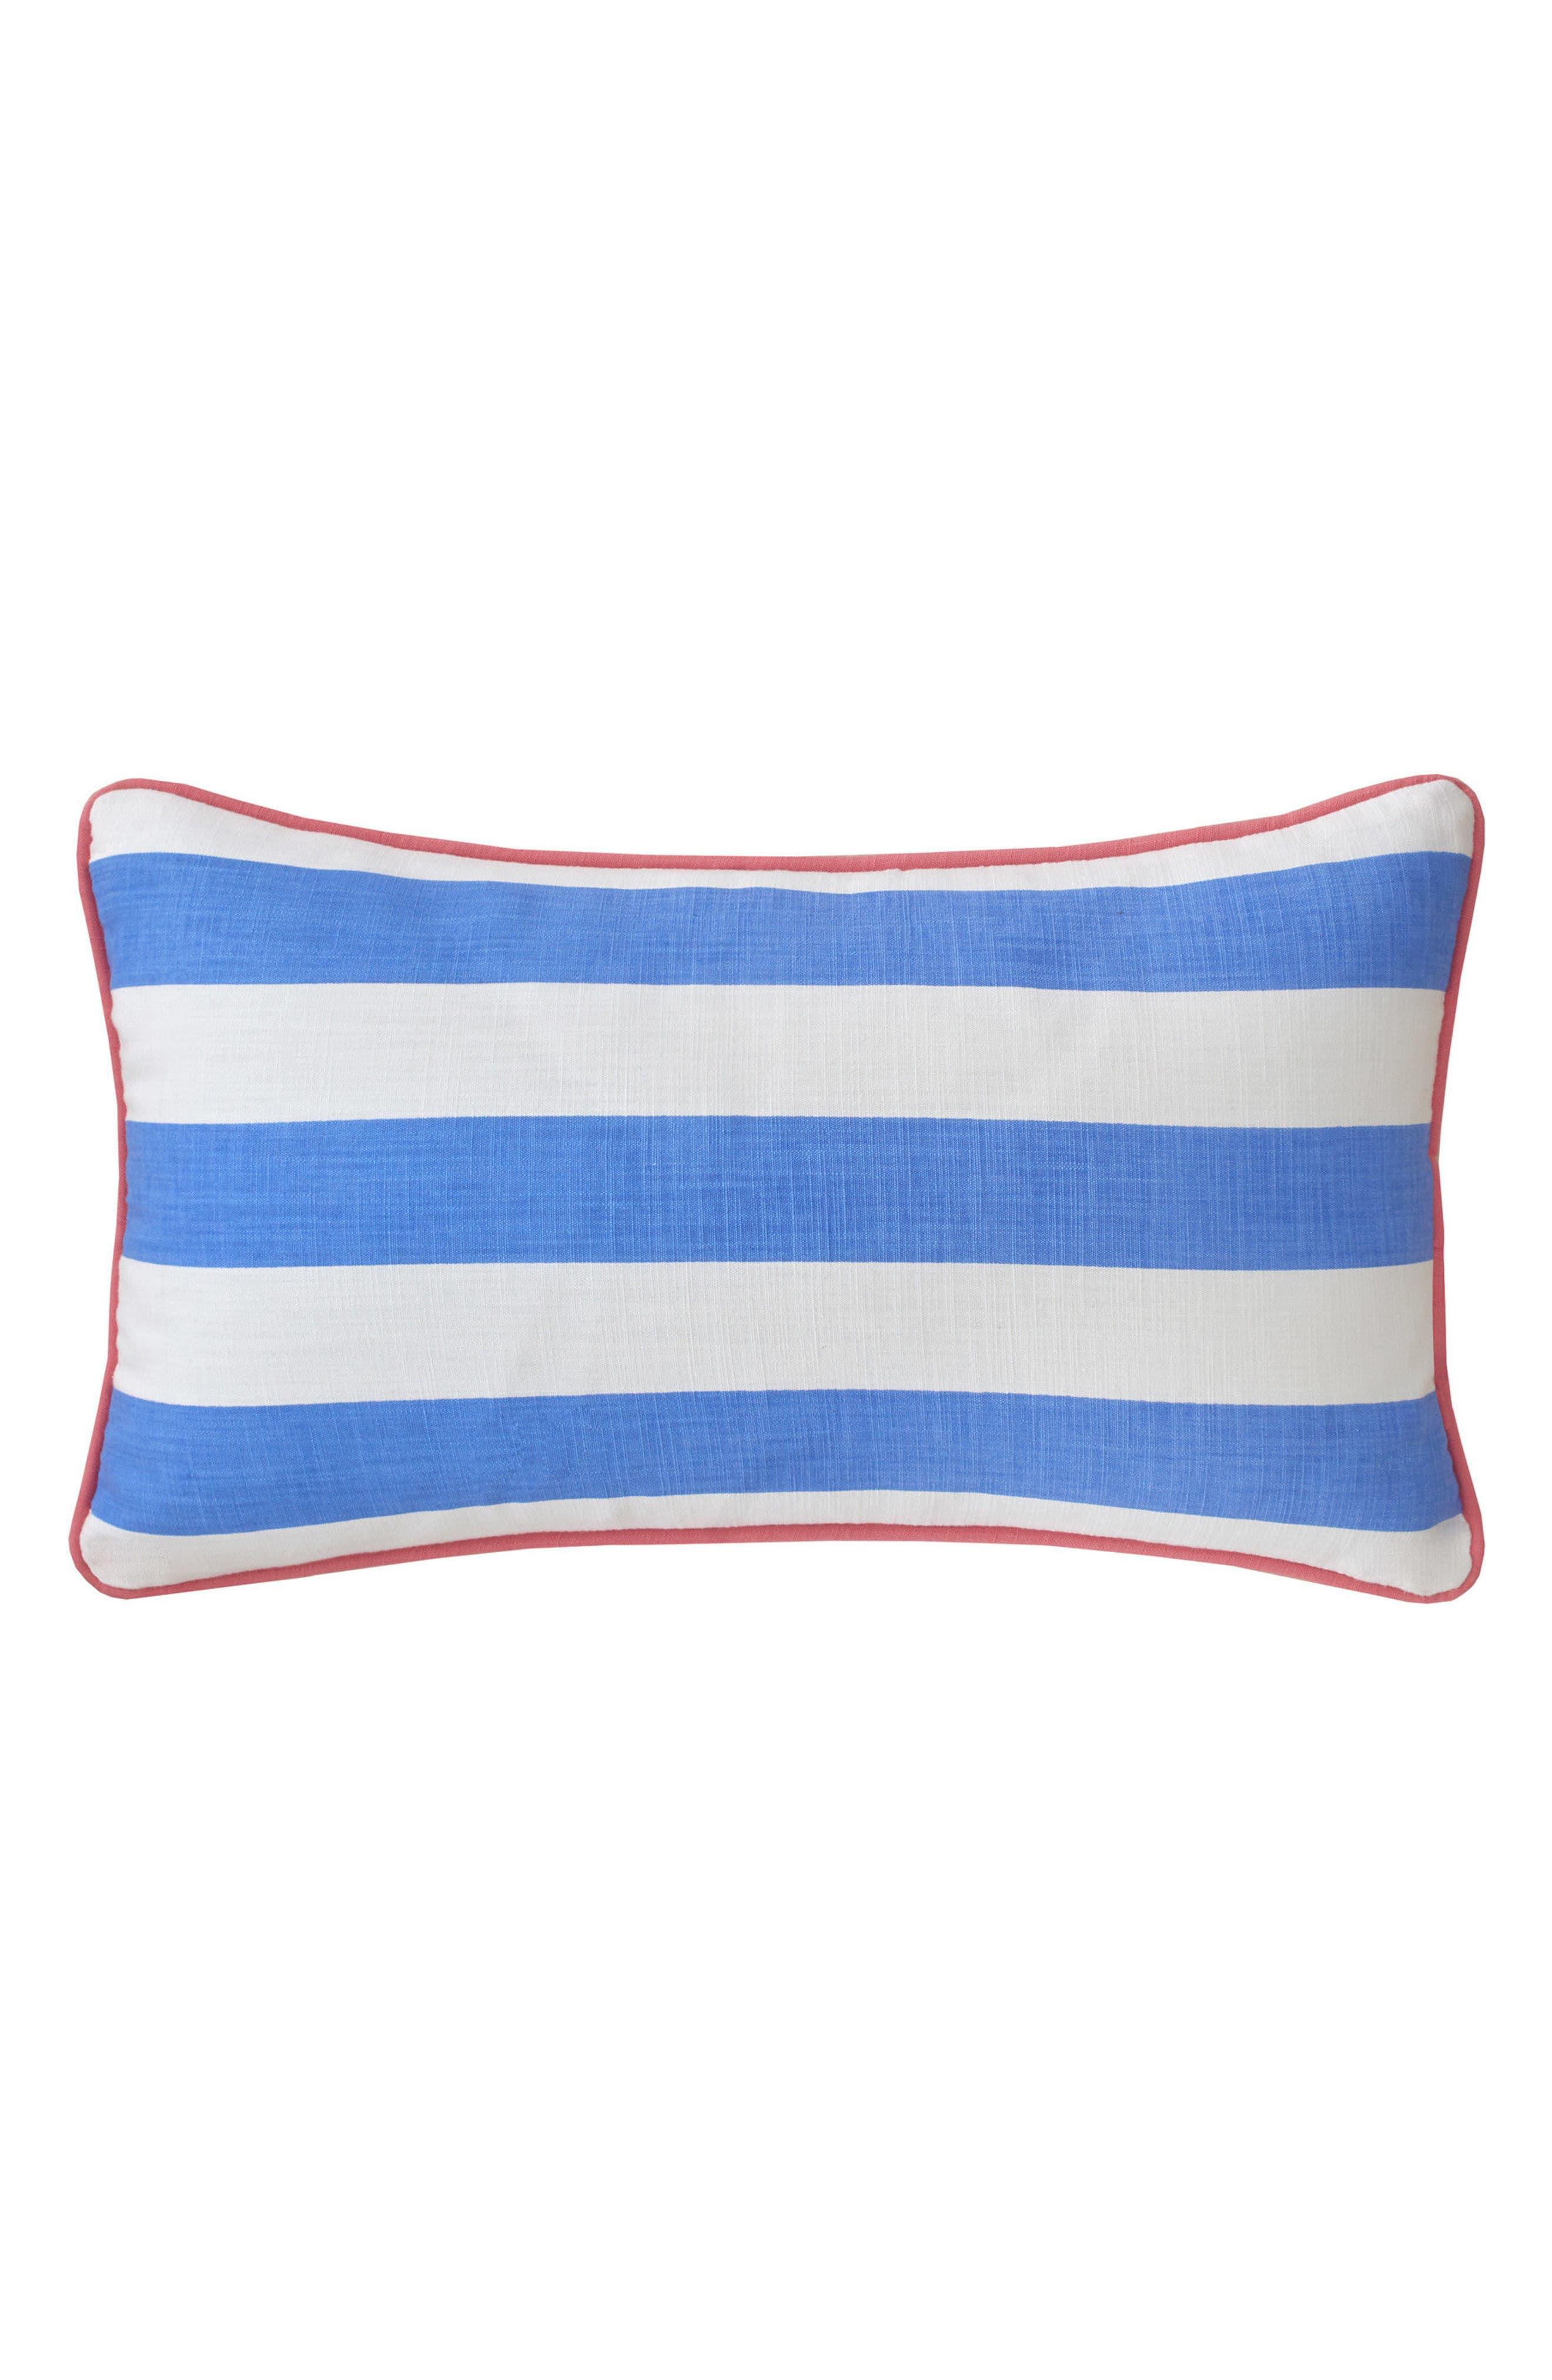 Main Image - Southern Tide Coastal Ikat Stripe Accent Pillow